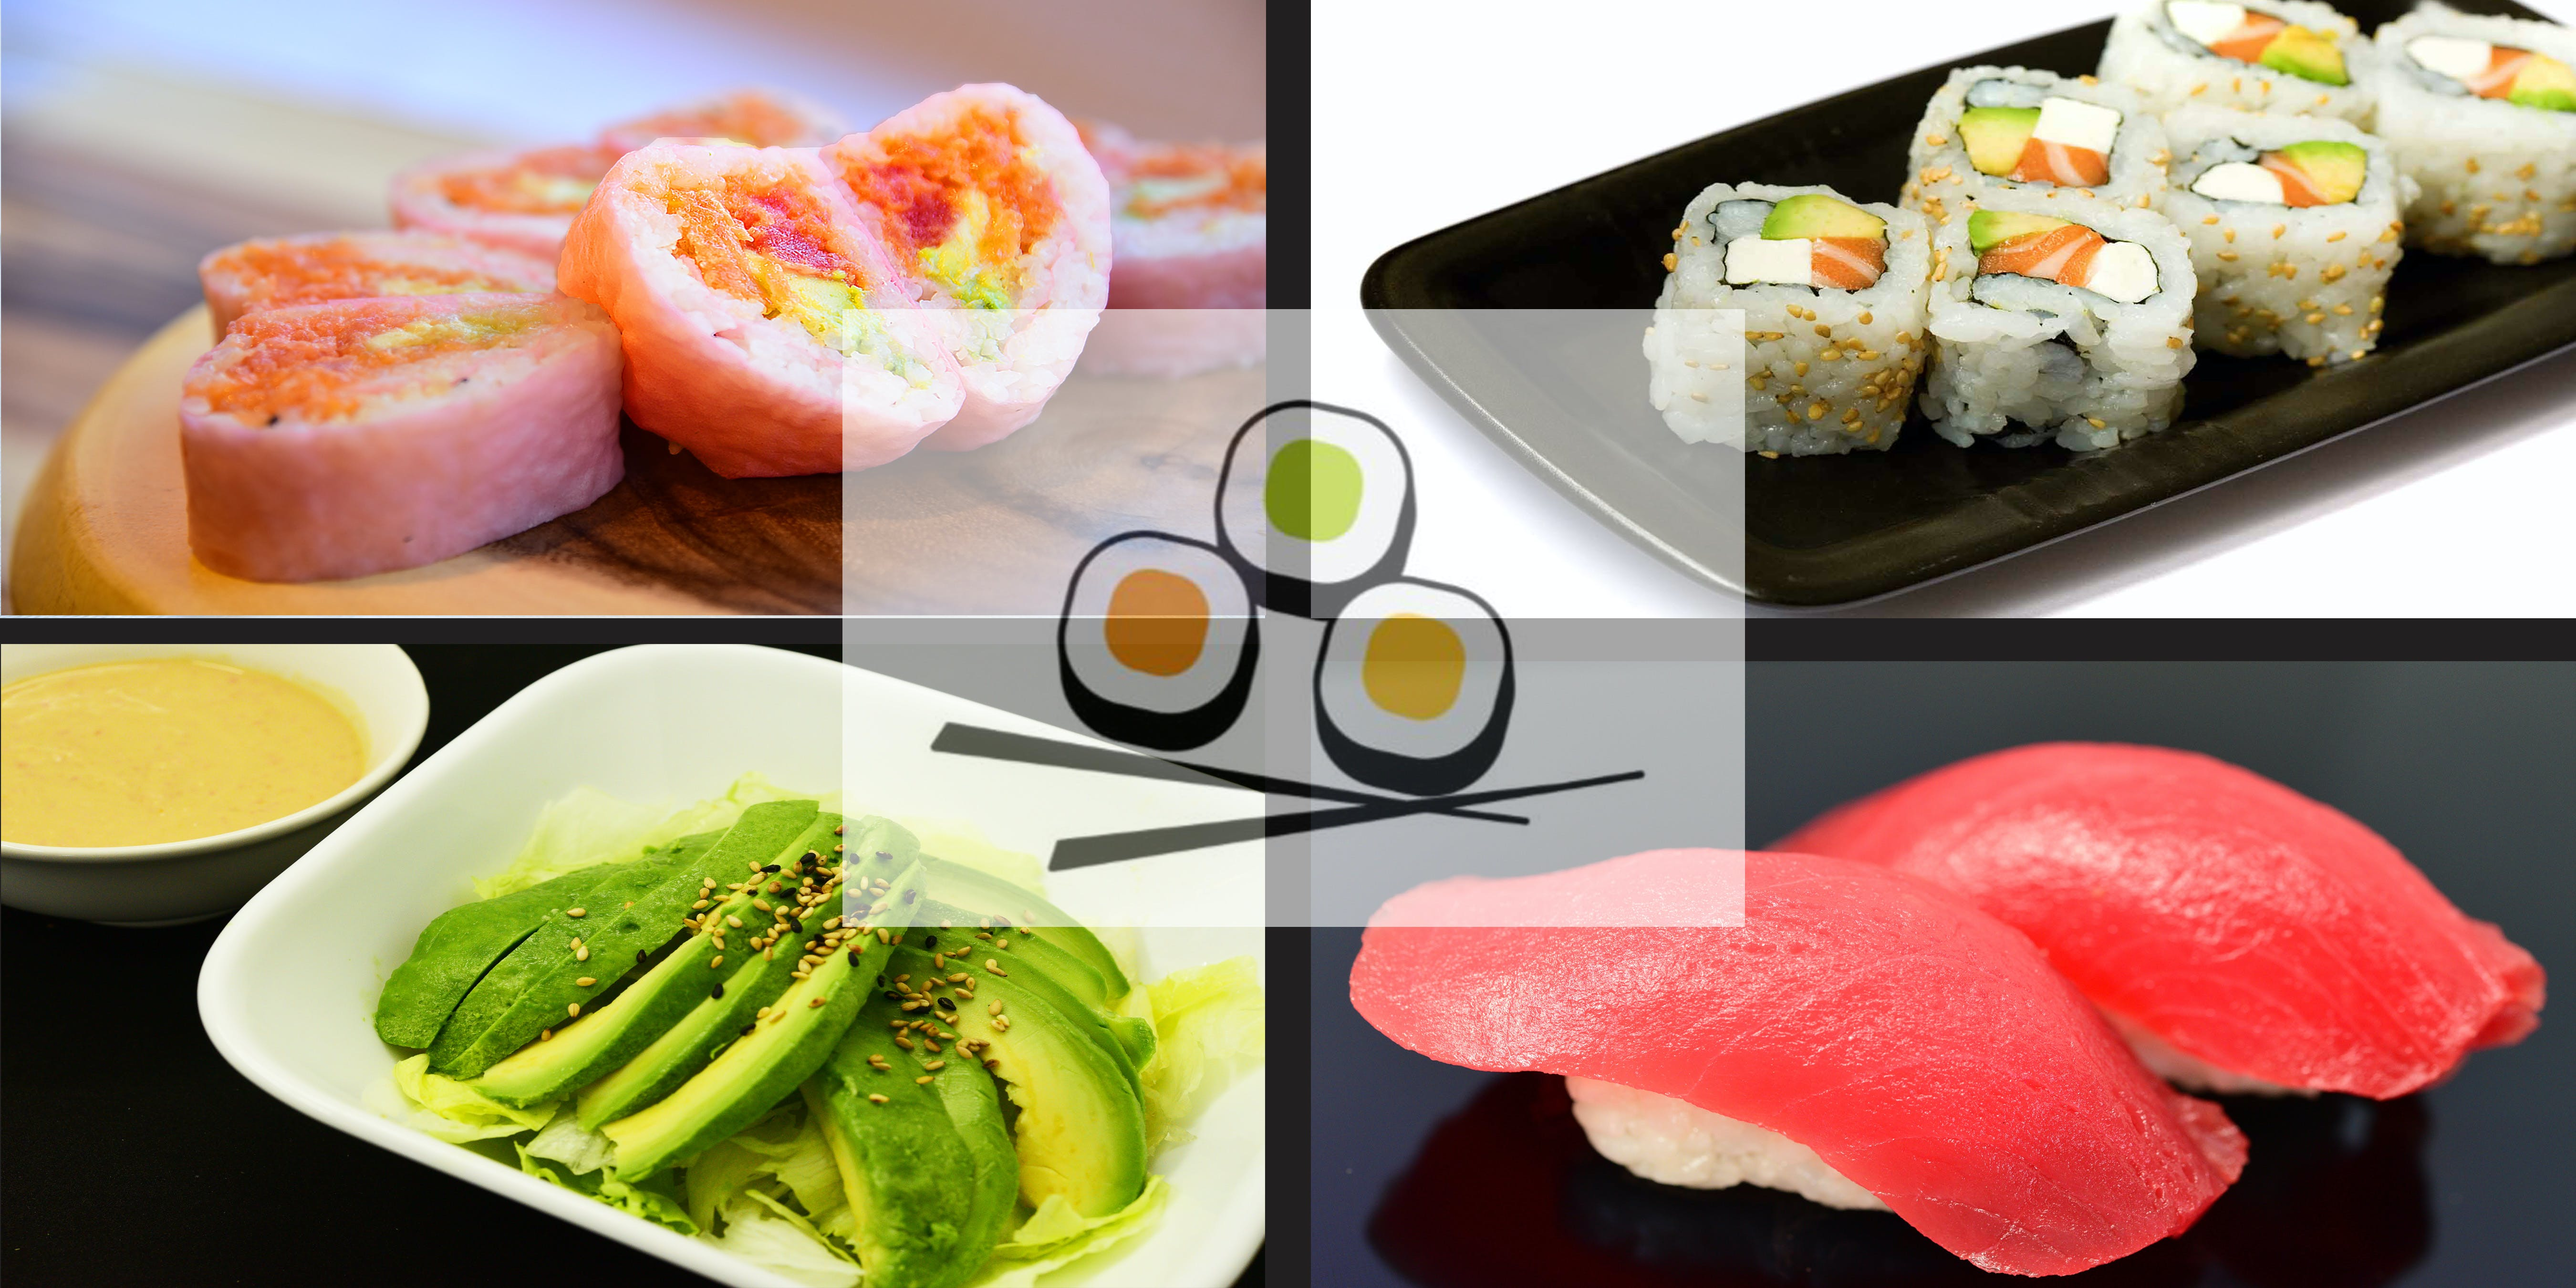 Sushi Express in Madison - Highlight